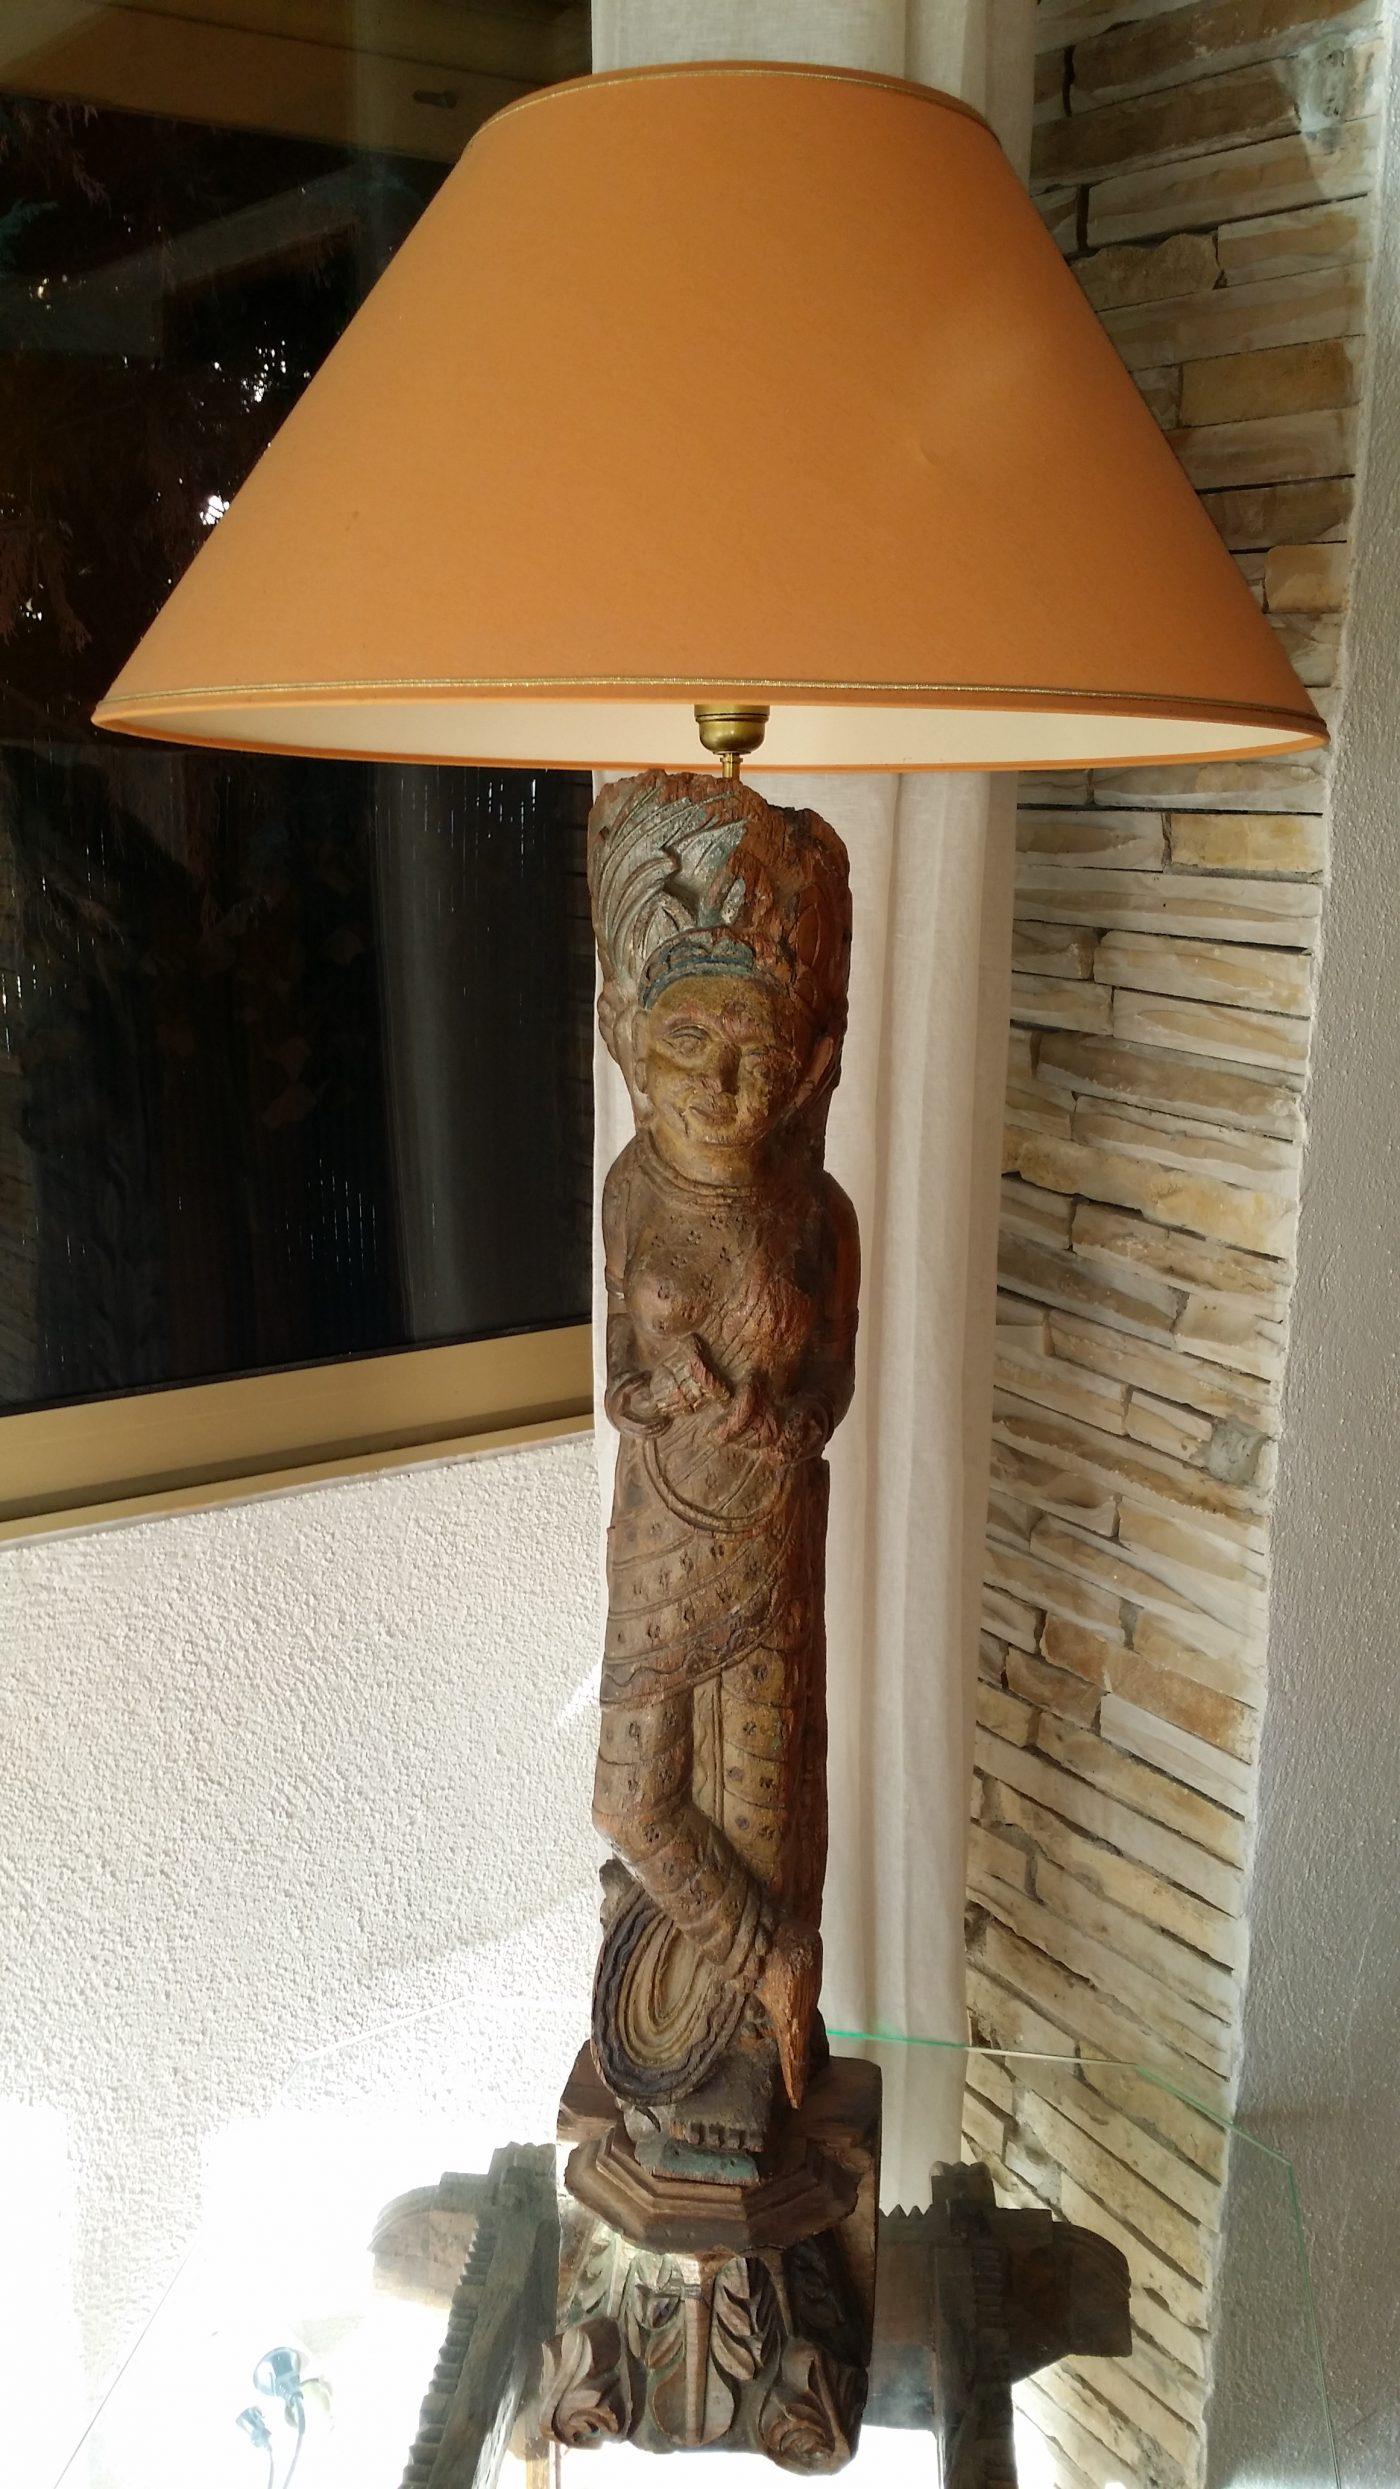 Transformer un corbeau d'haveli / Inde du Nord en lampe